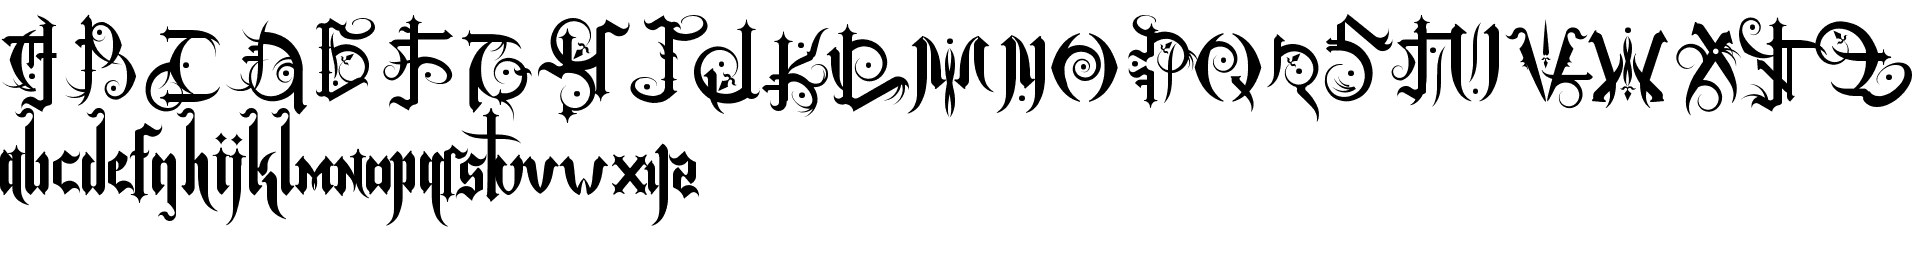 Baltimore Goth